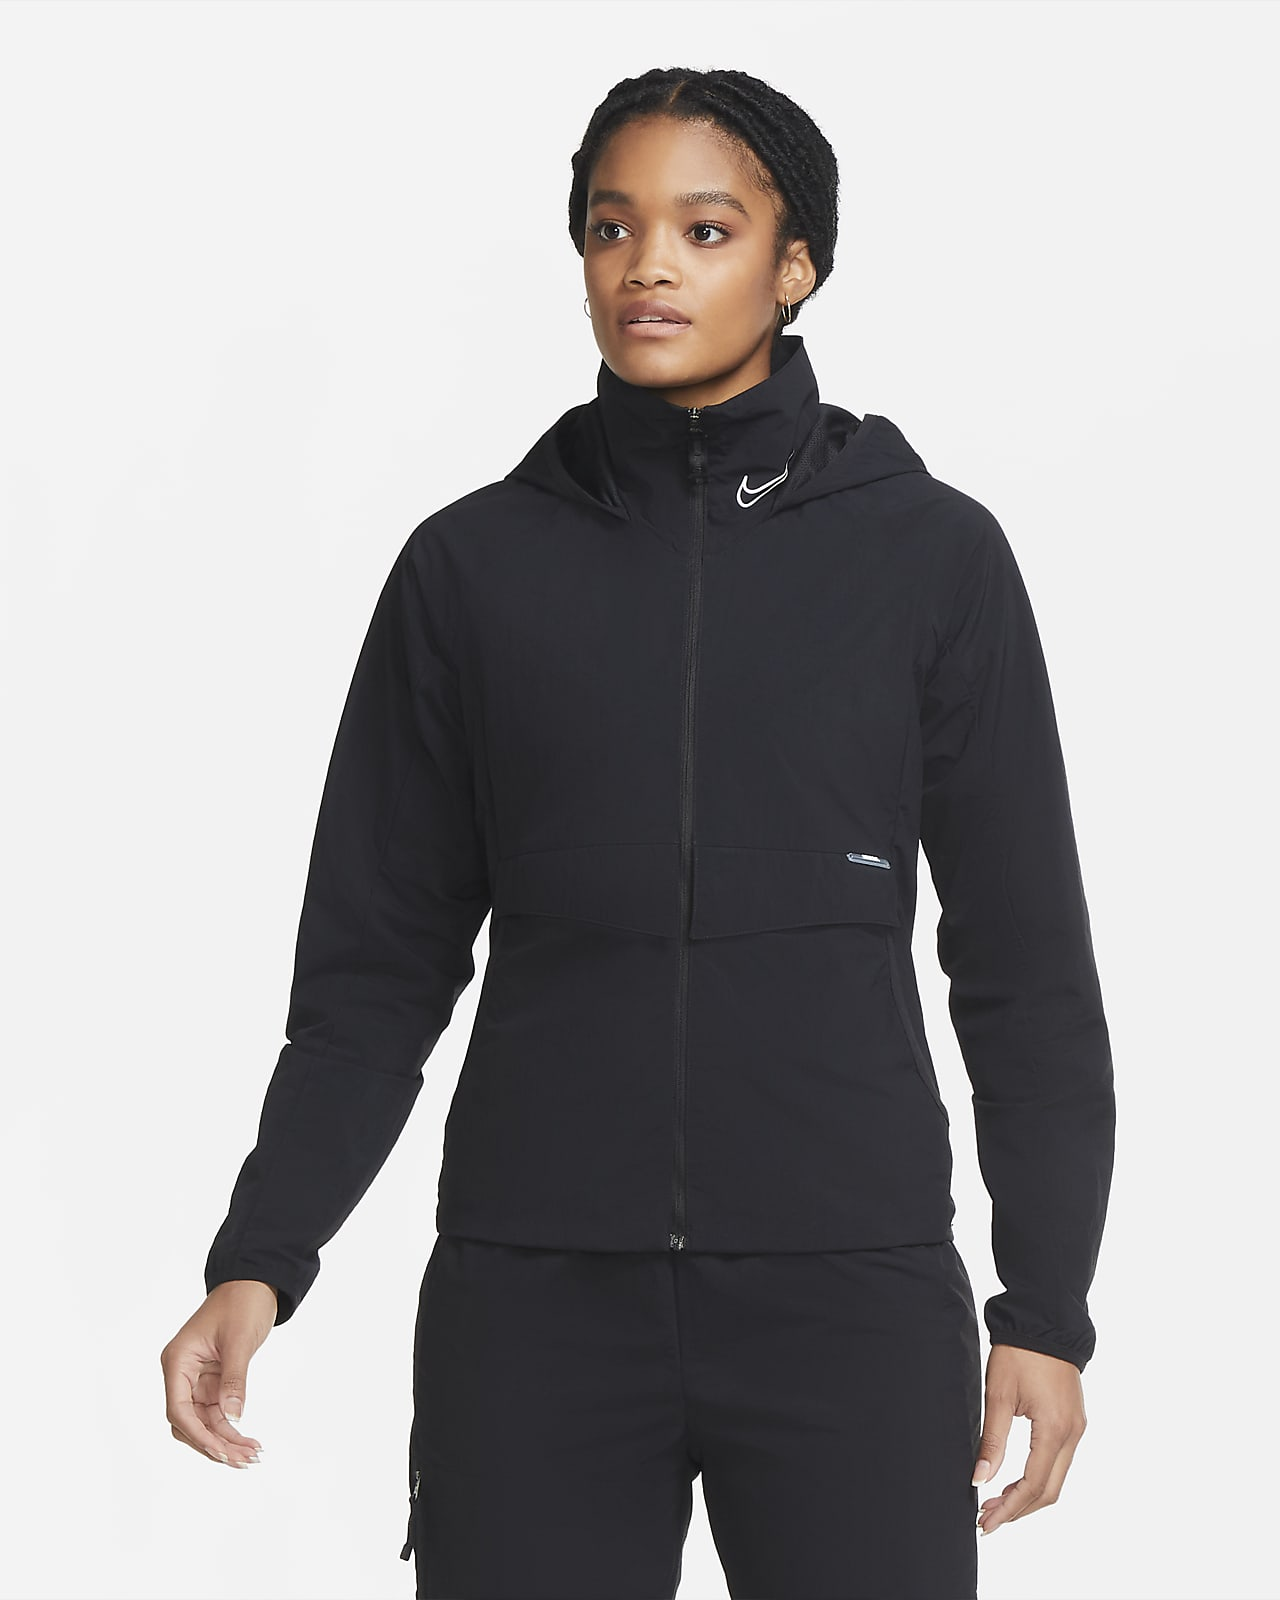 Nike F.C. AWF Women's Soccer Jacket